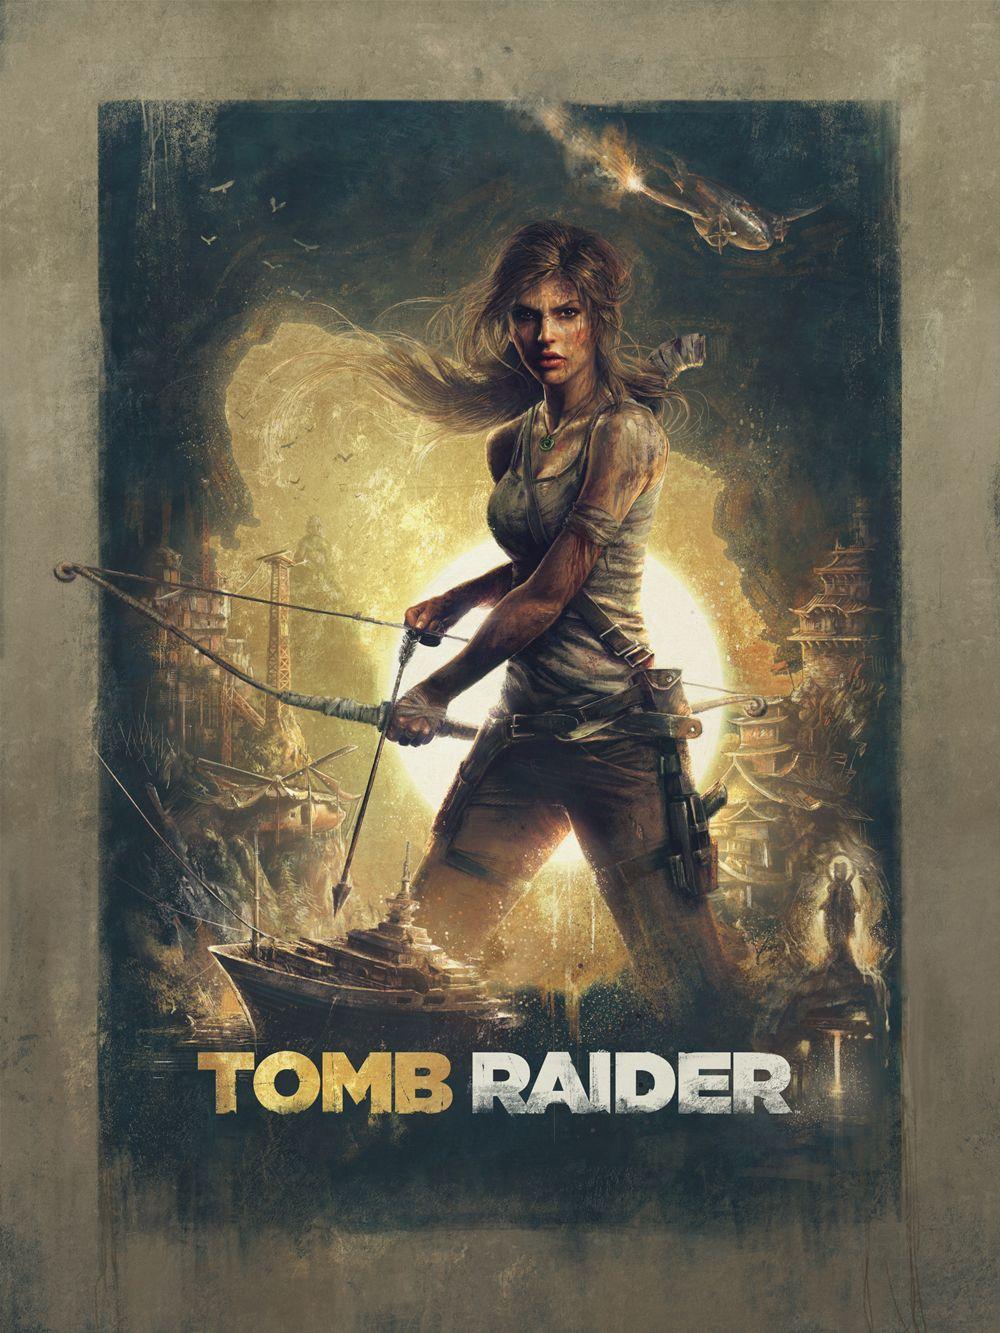 Tomb Raider Official Poster Illustrated By Sam Spratt Tomb